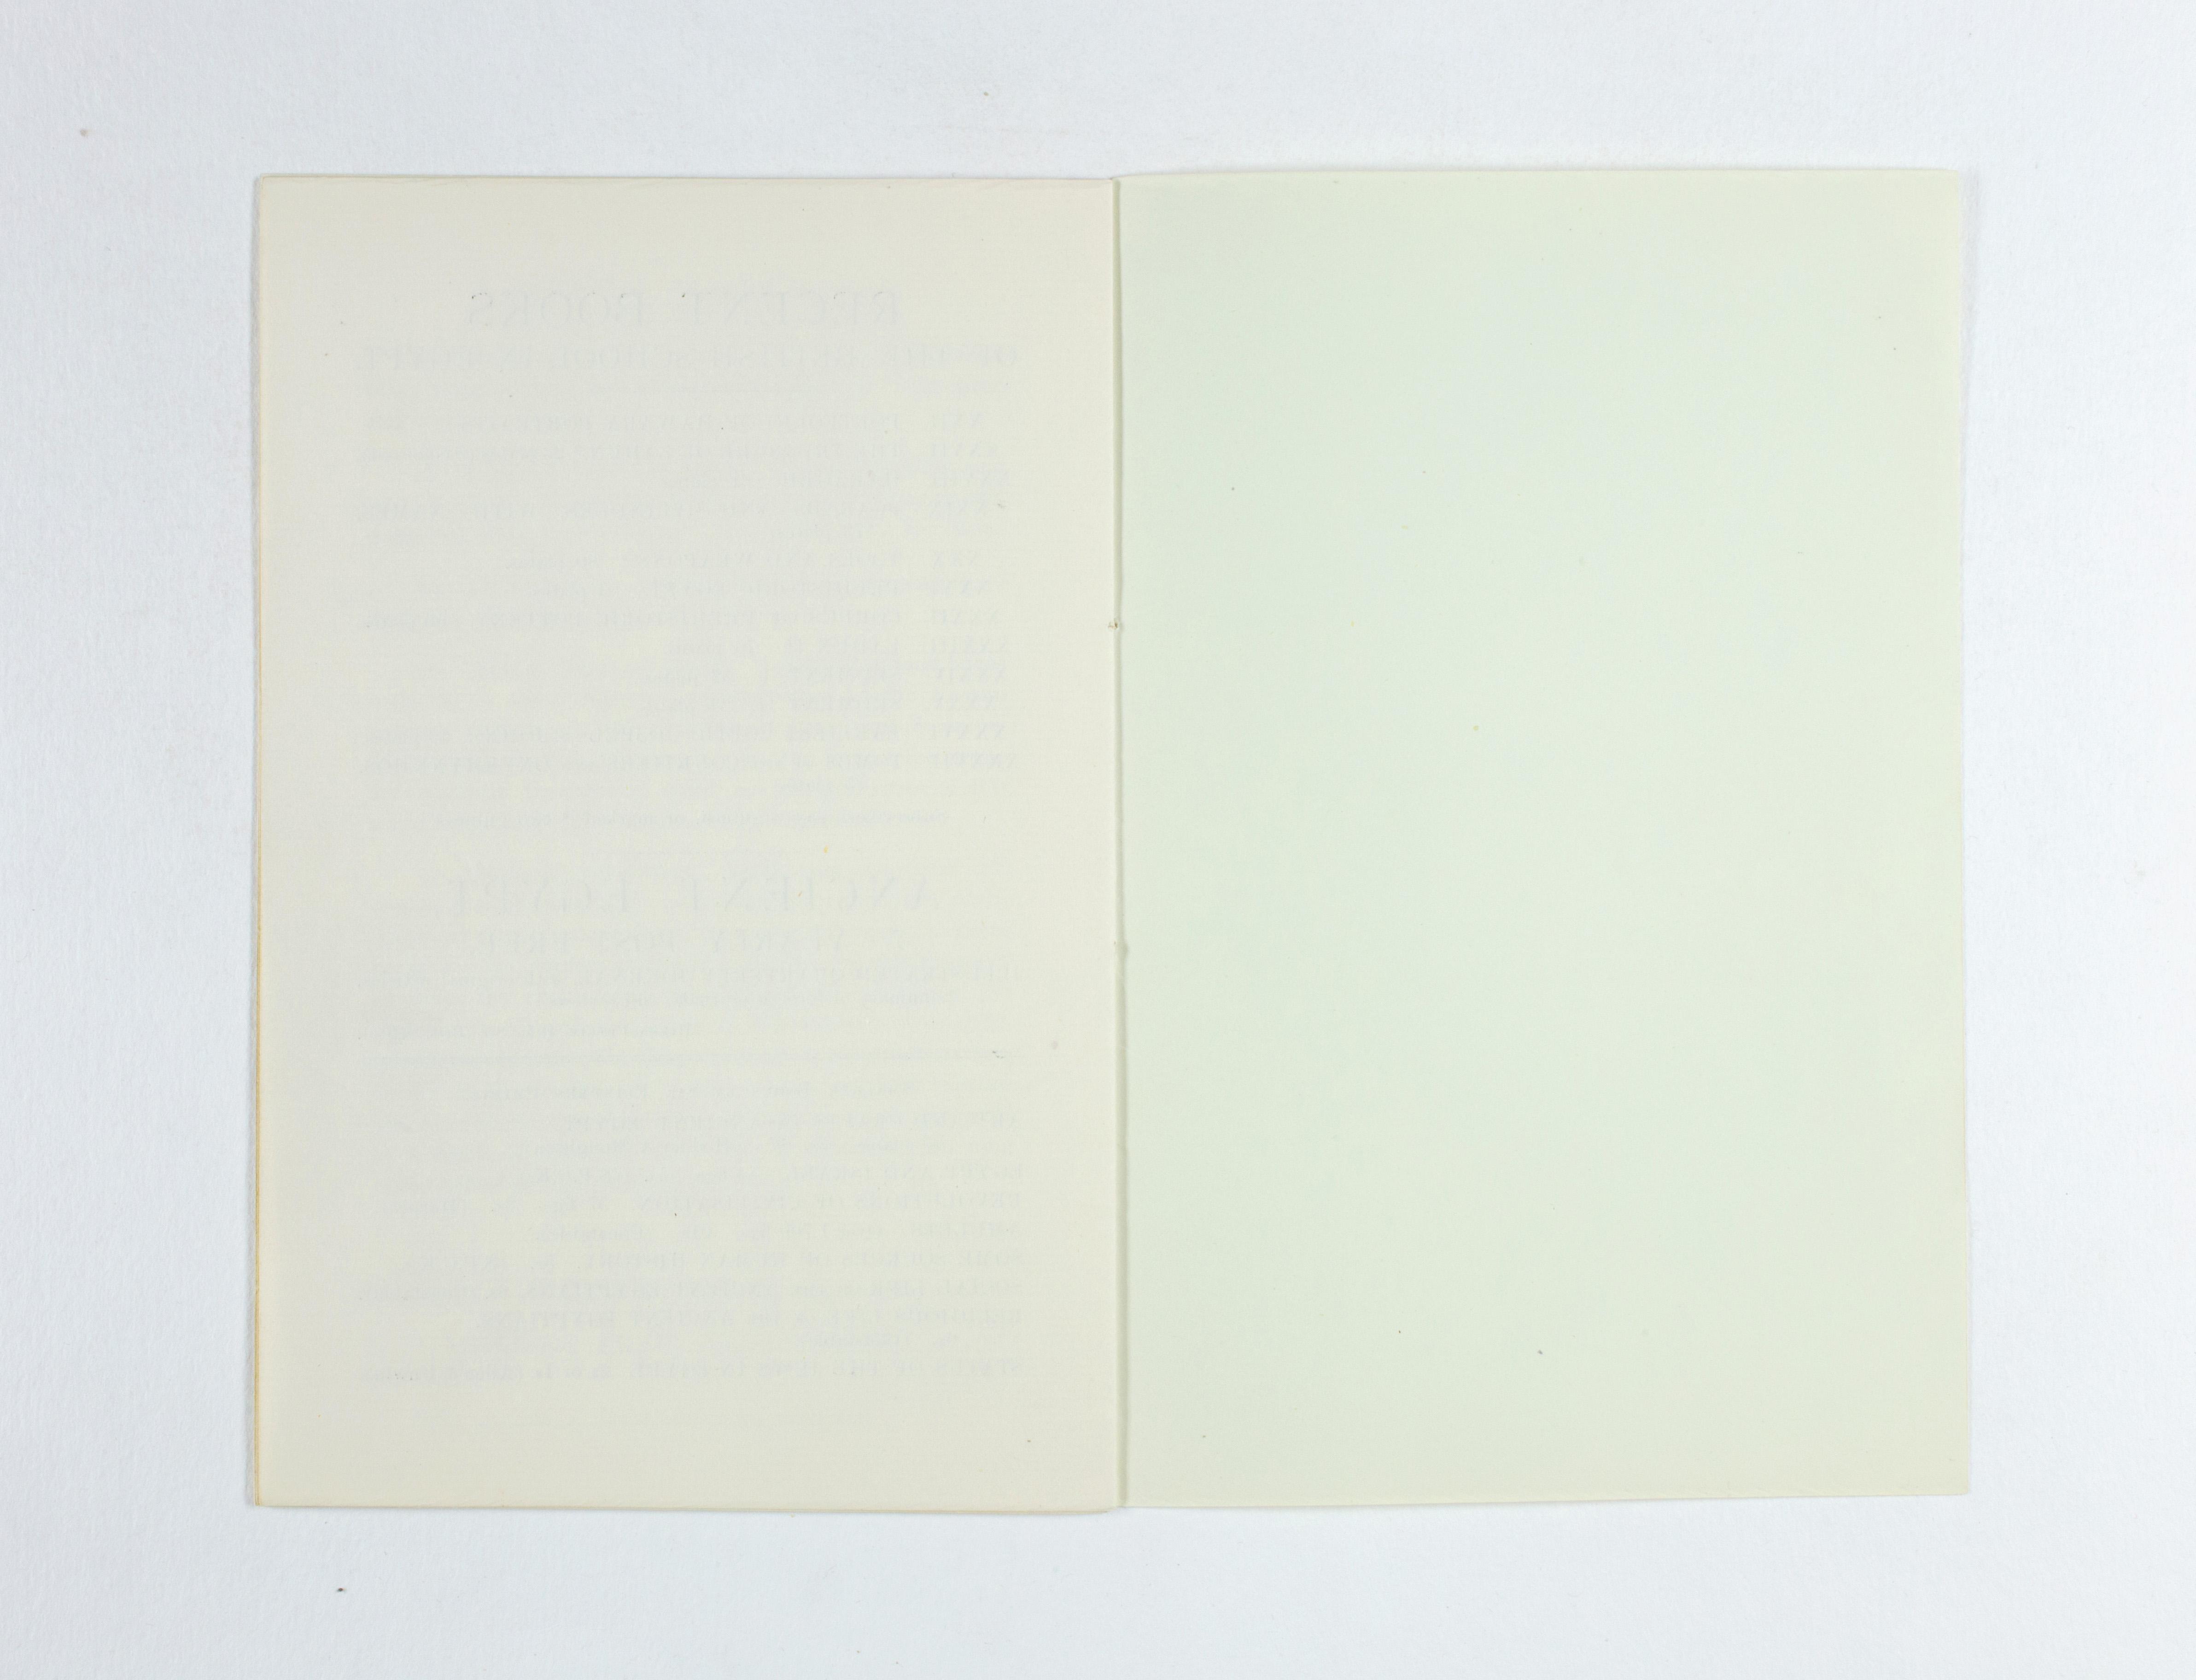 1924-25 Badari, Faiyum Exhibition catalogue PMA/WFP1/D/28/32.8